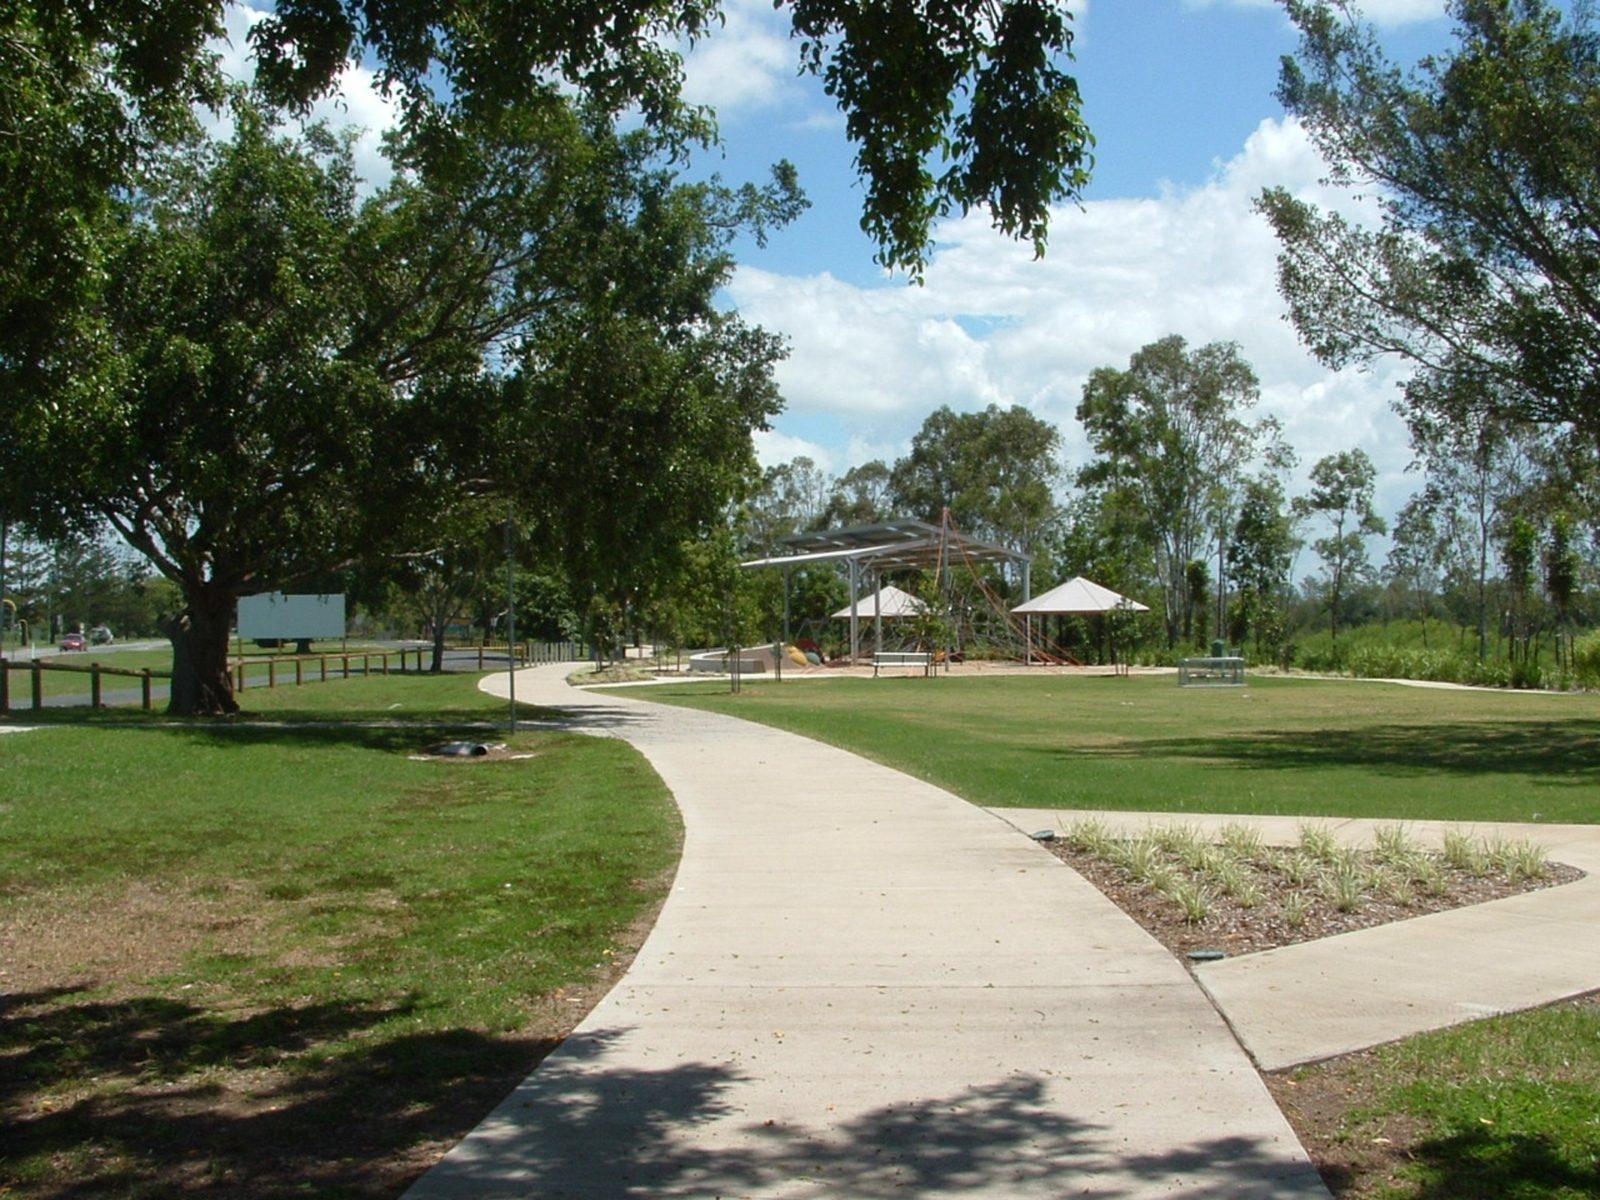 path to playground